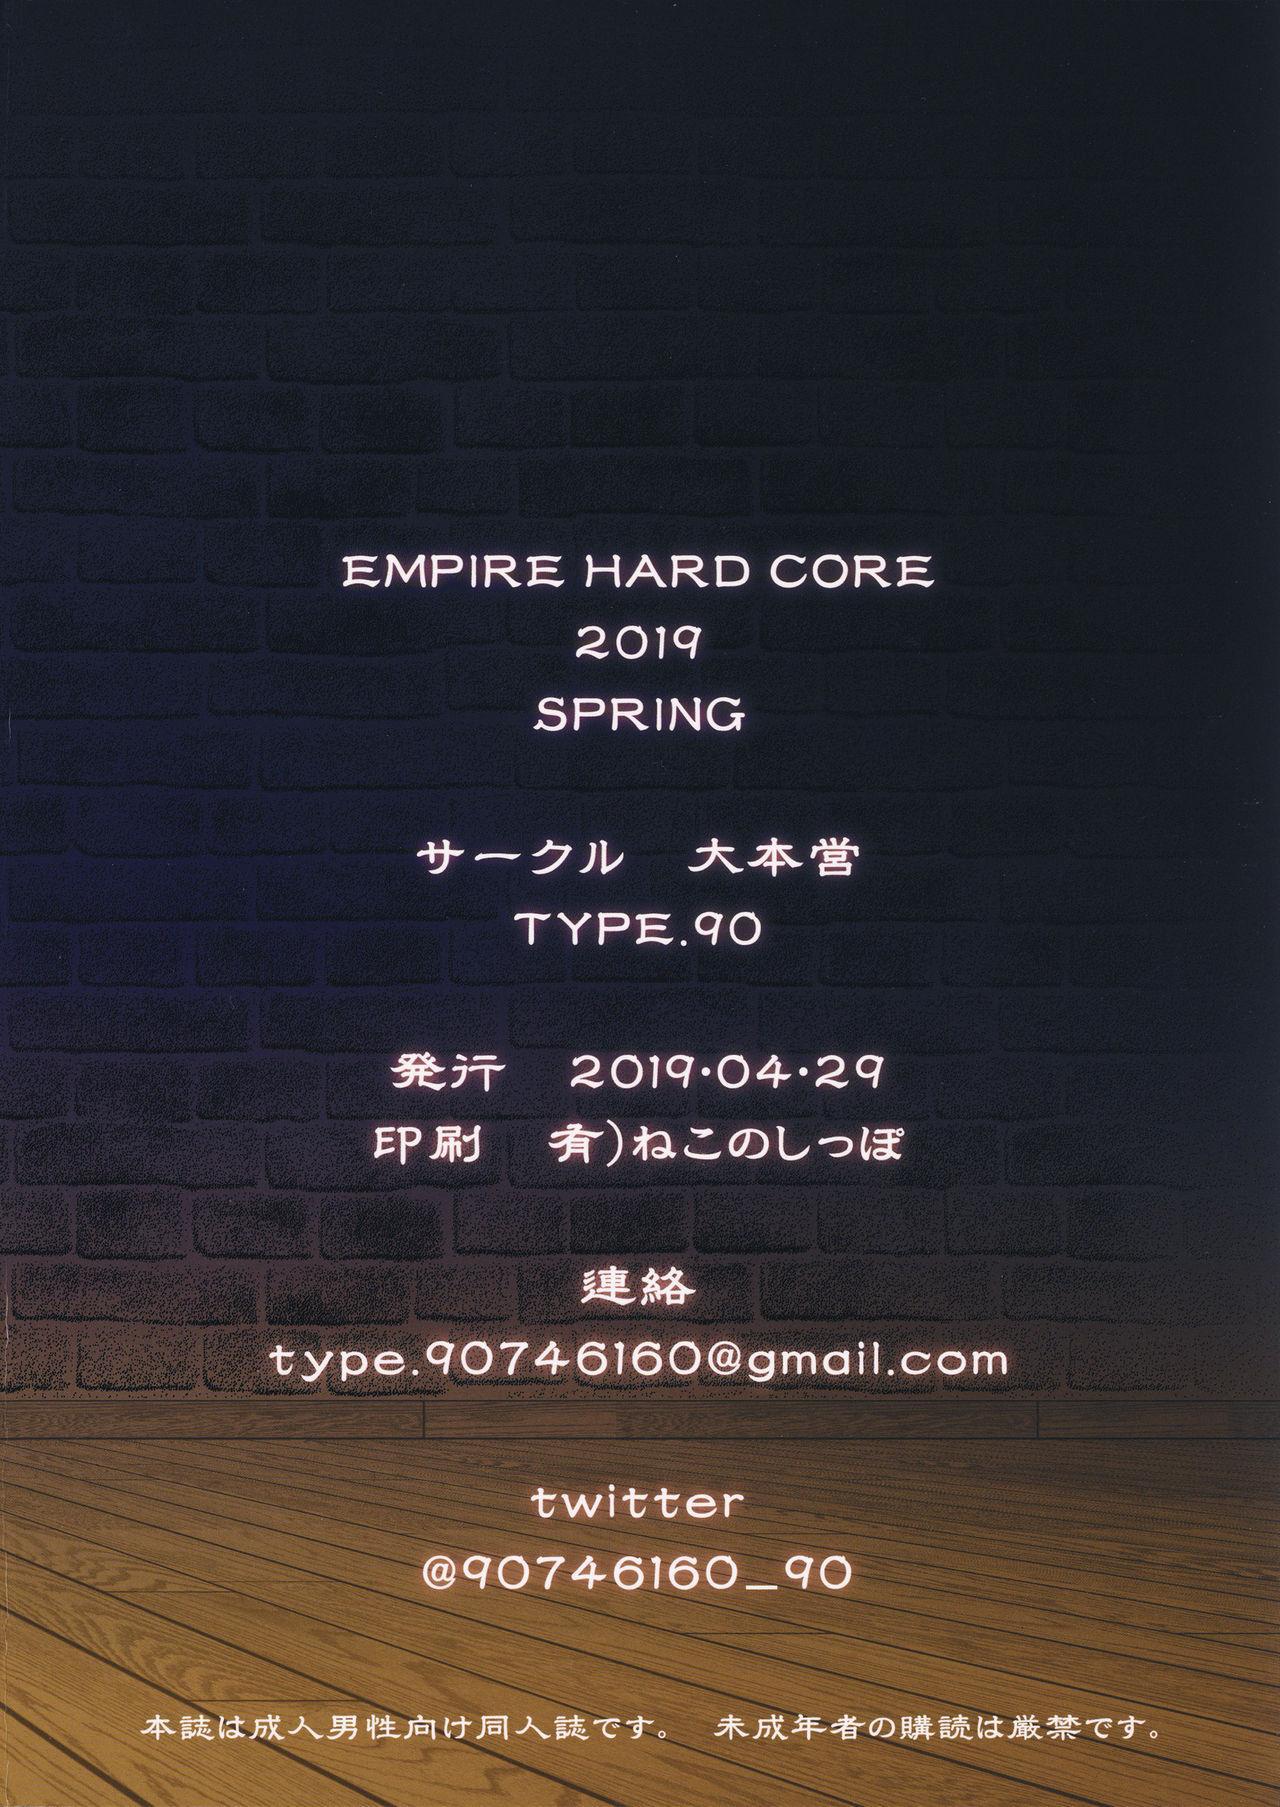 EMPIRE HARD CORE 2019 SPRING 26